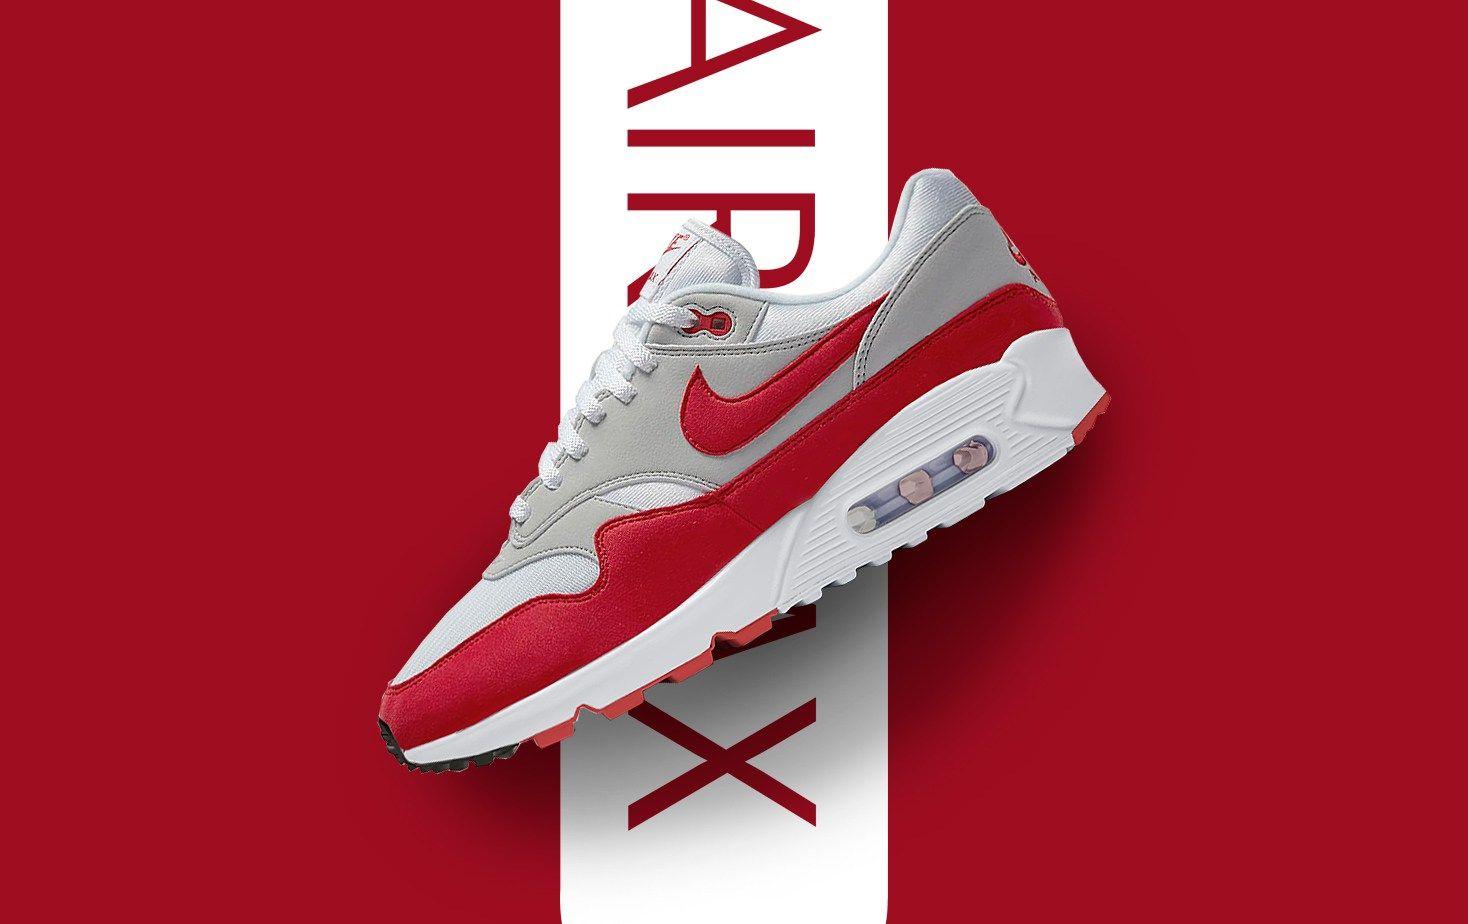 b0fecff9e807e Preview  Nike Air Max 1 90 - EU Kicks  Sneaker Magazine